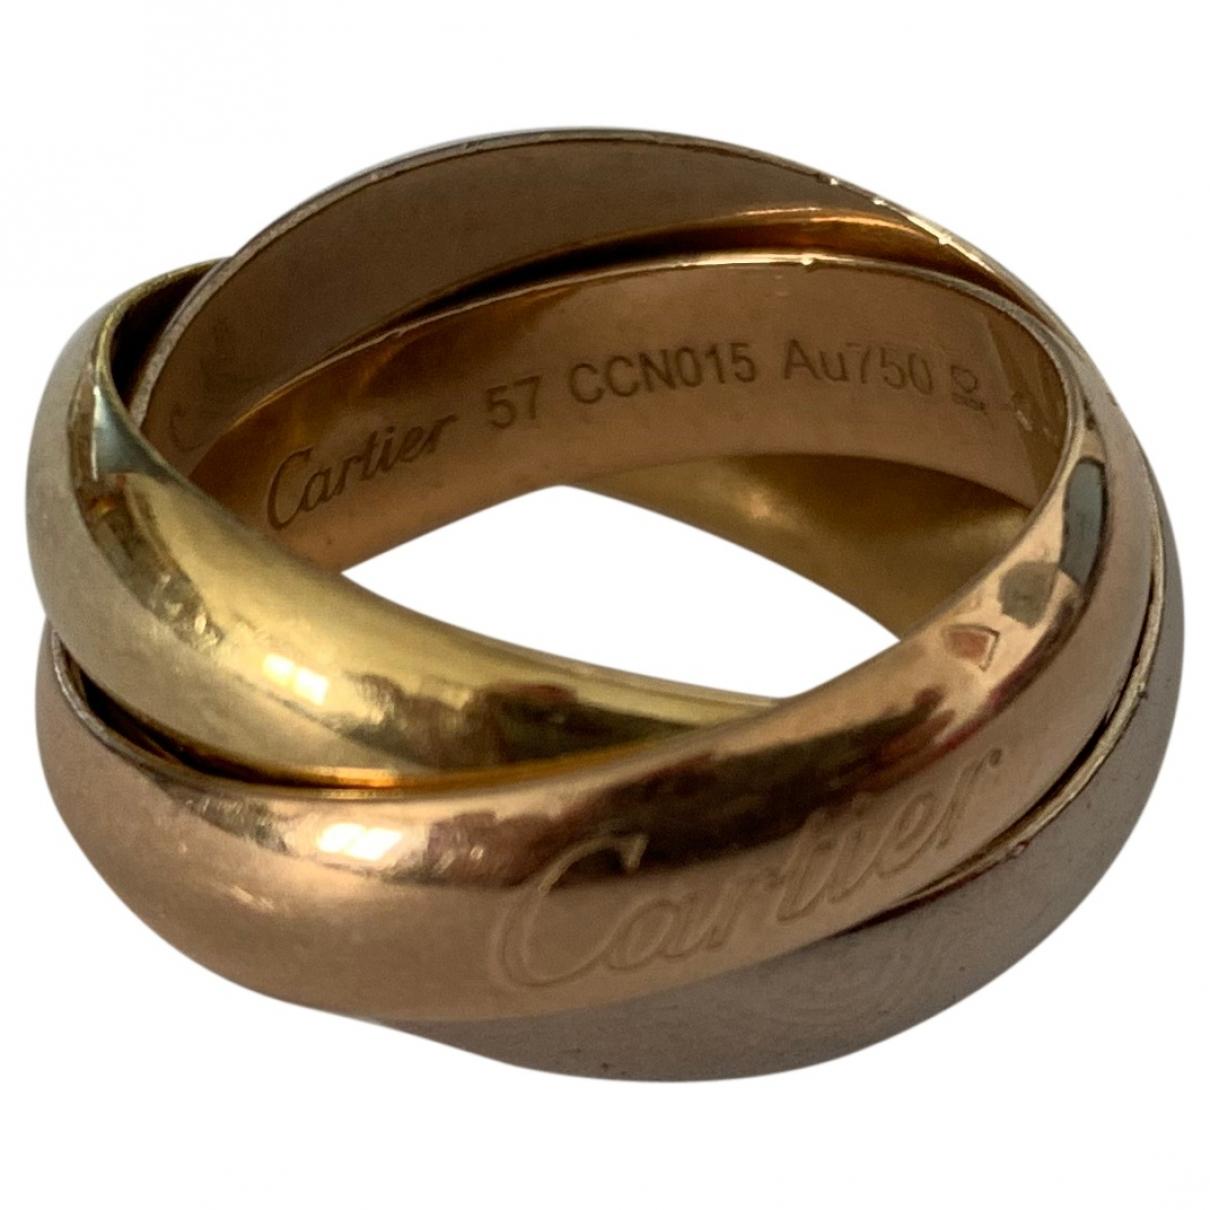 Cartier Trinity Ring in  Gelb Gelbgold